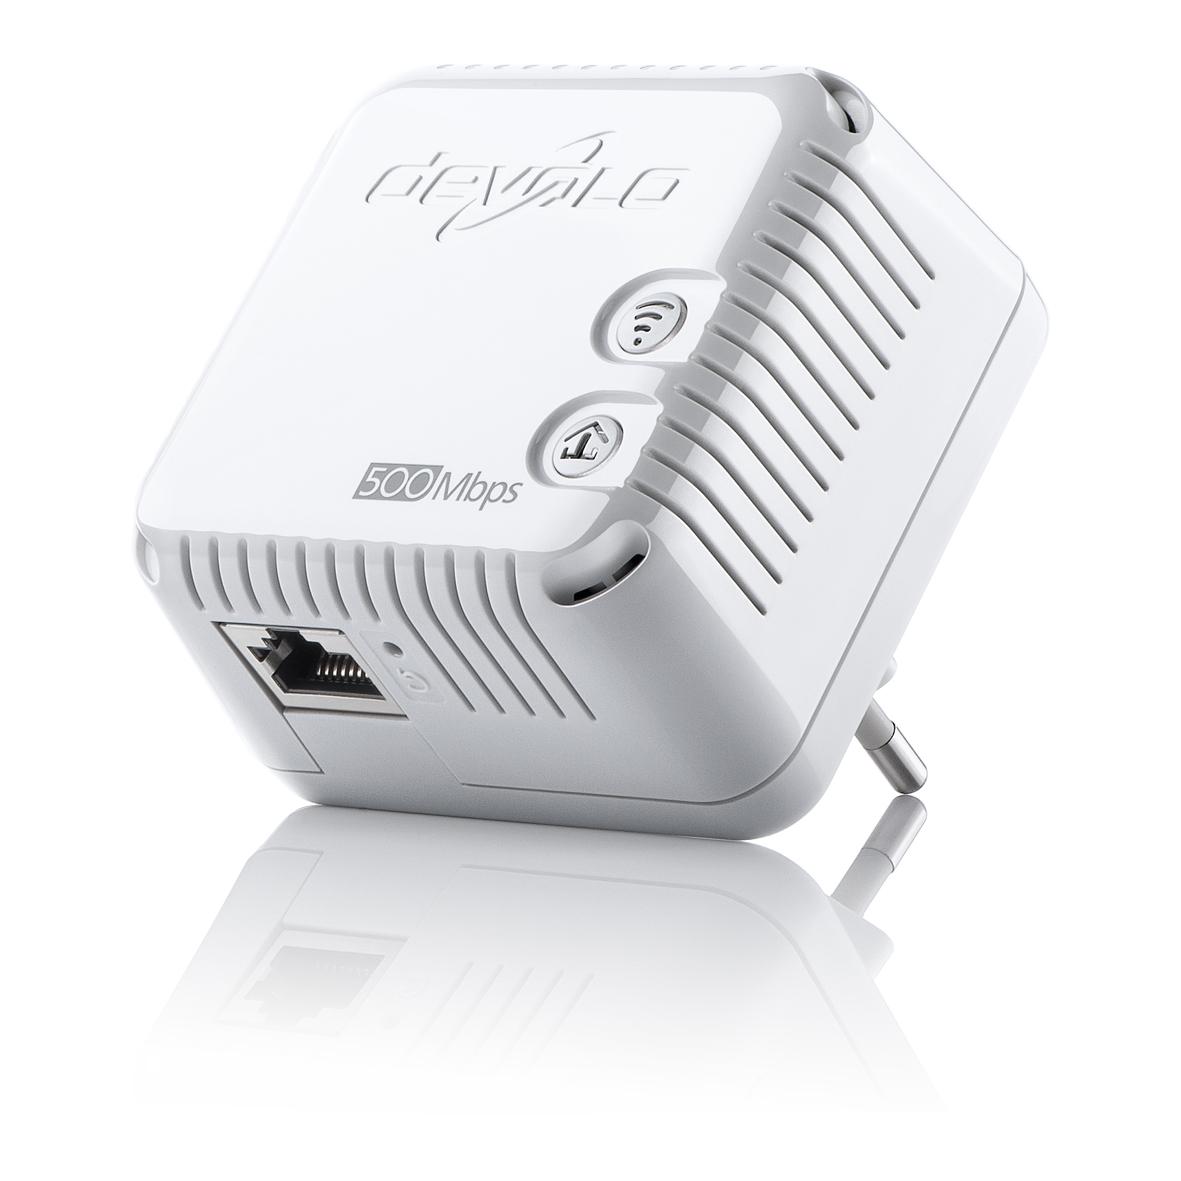 Informador Digital: Devolo dLAN® 500 WiFi